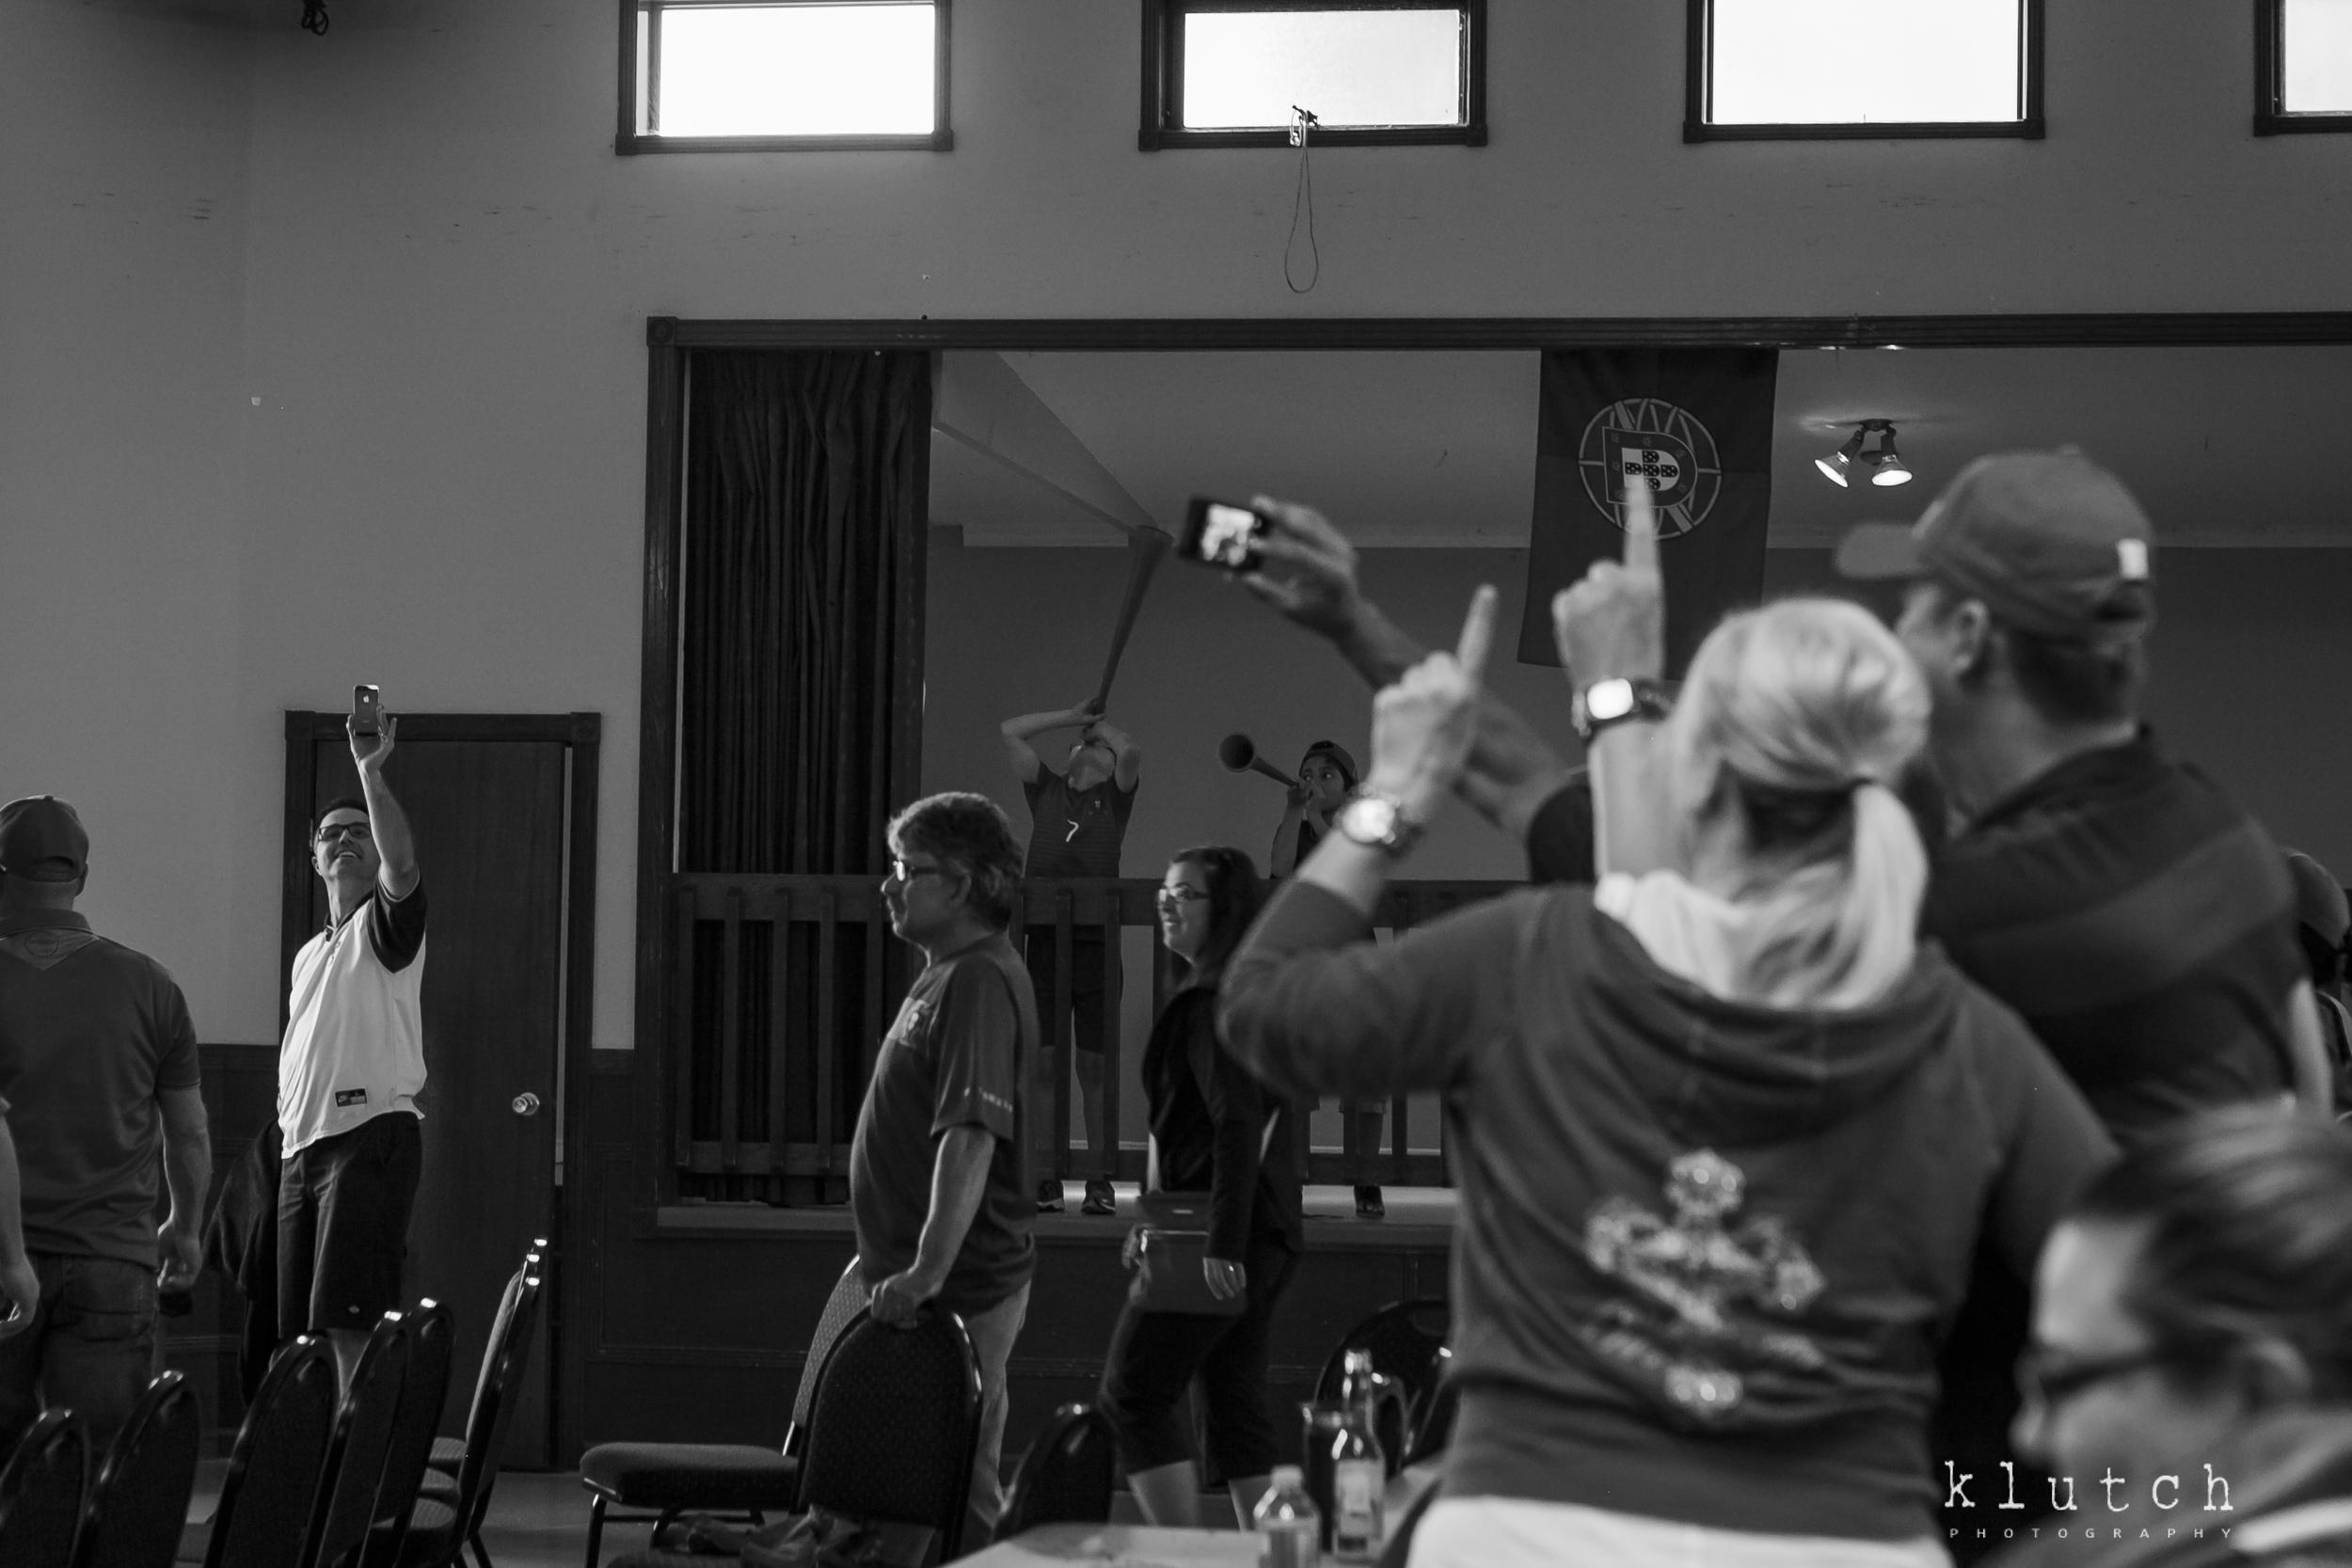 Klutch Photography, vancouver family photographer, surrey family photographer, vancouver newnorn photographer, surrey newborn photographer, candid photography, lifestlye photography, lifeunscripted photographer, -2-37.jpg